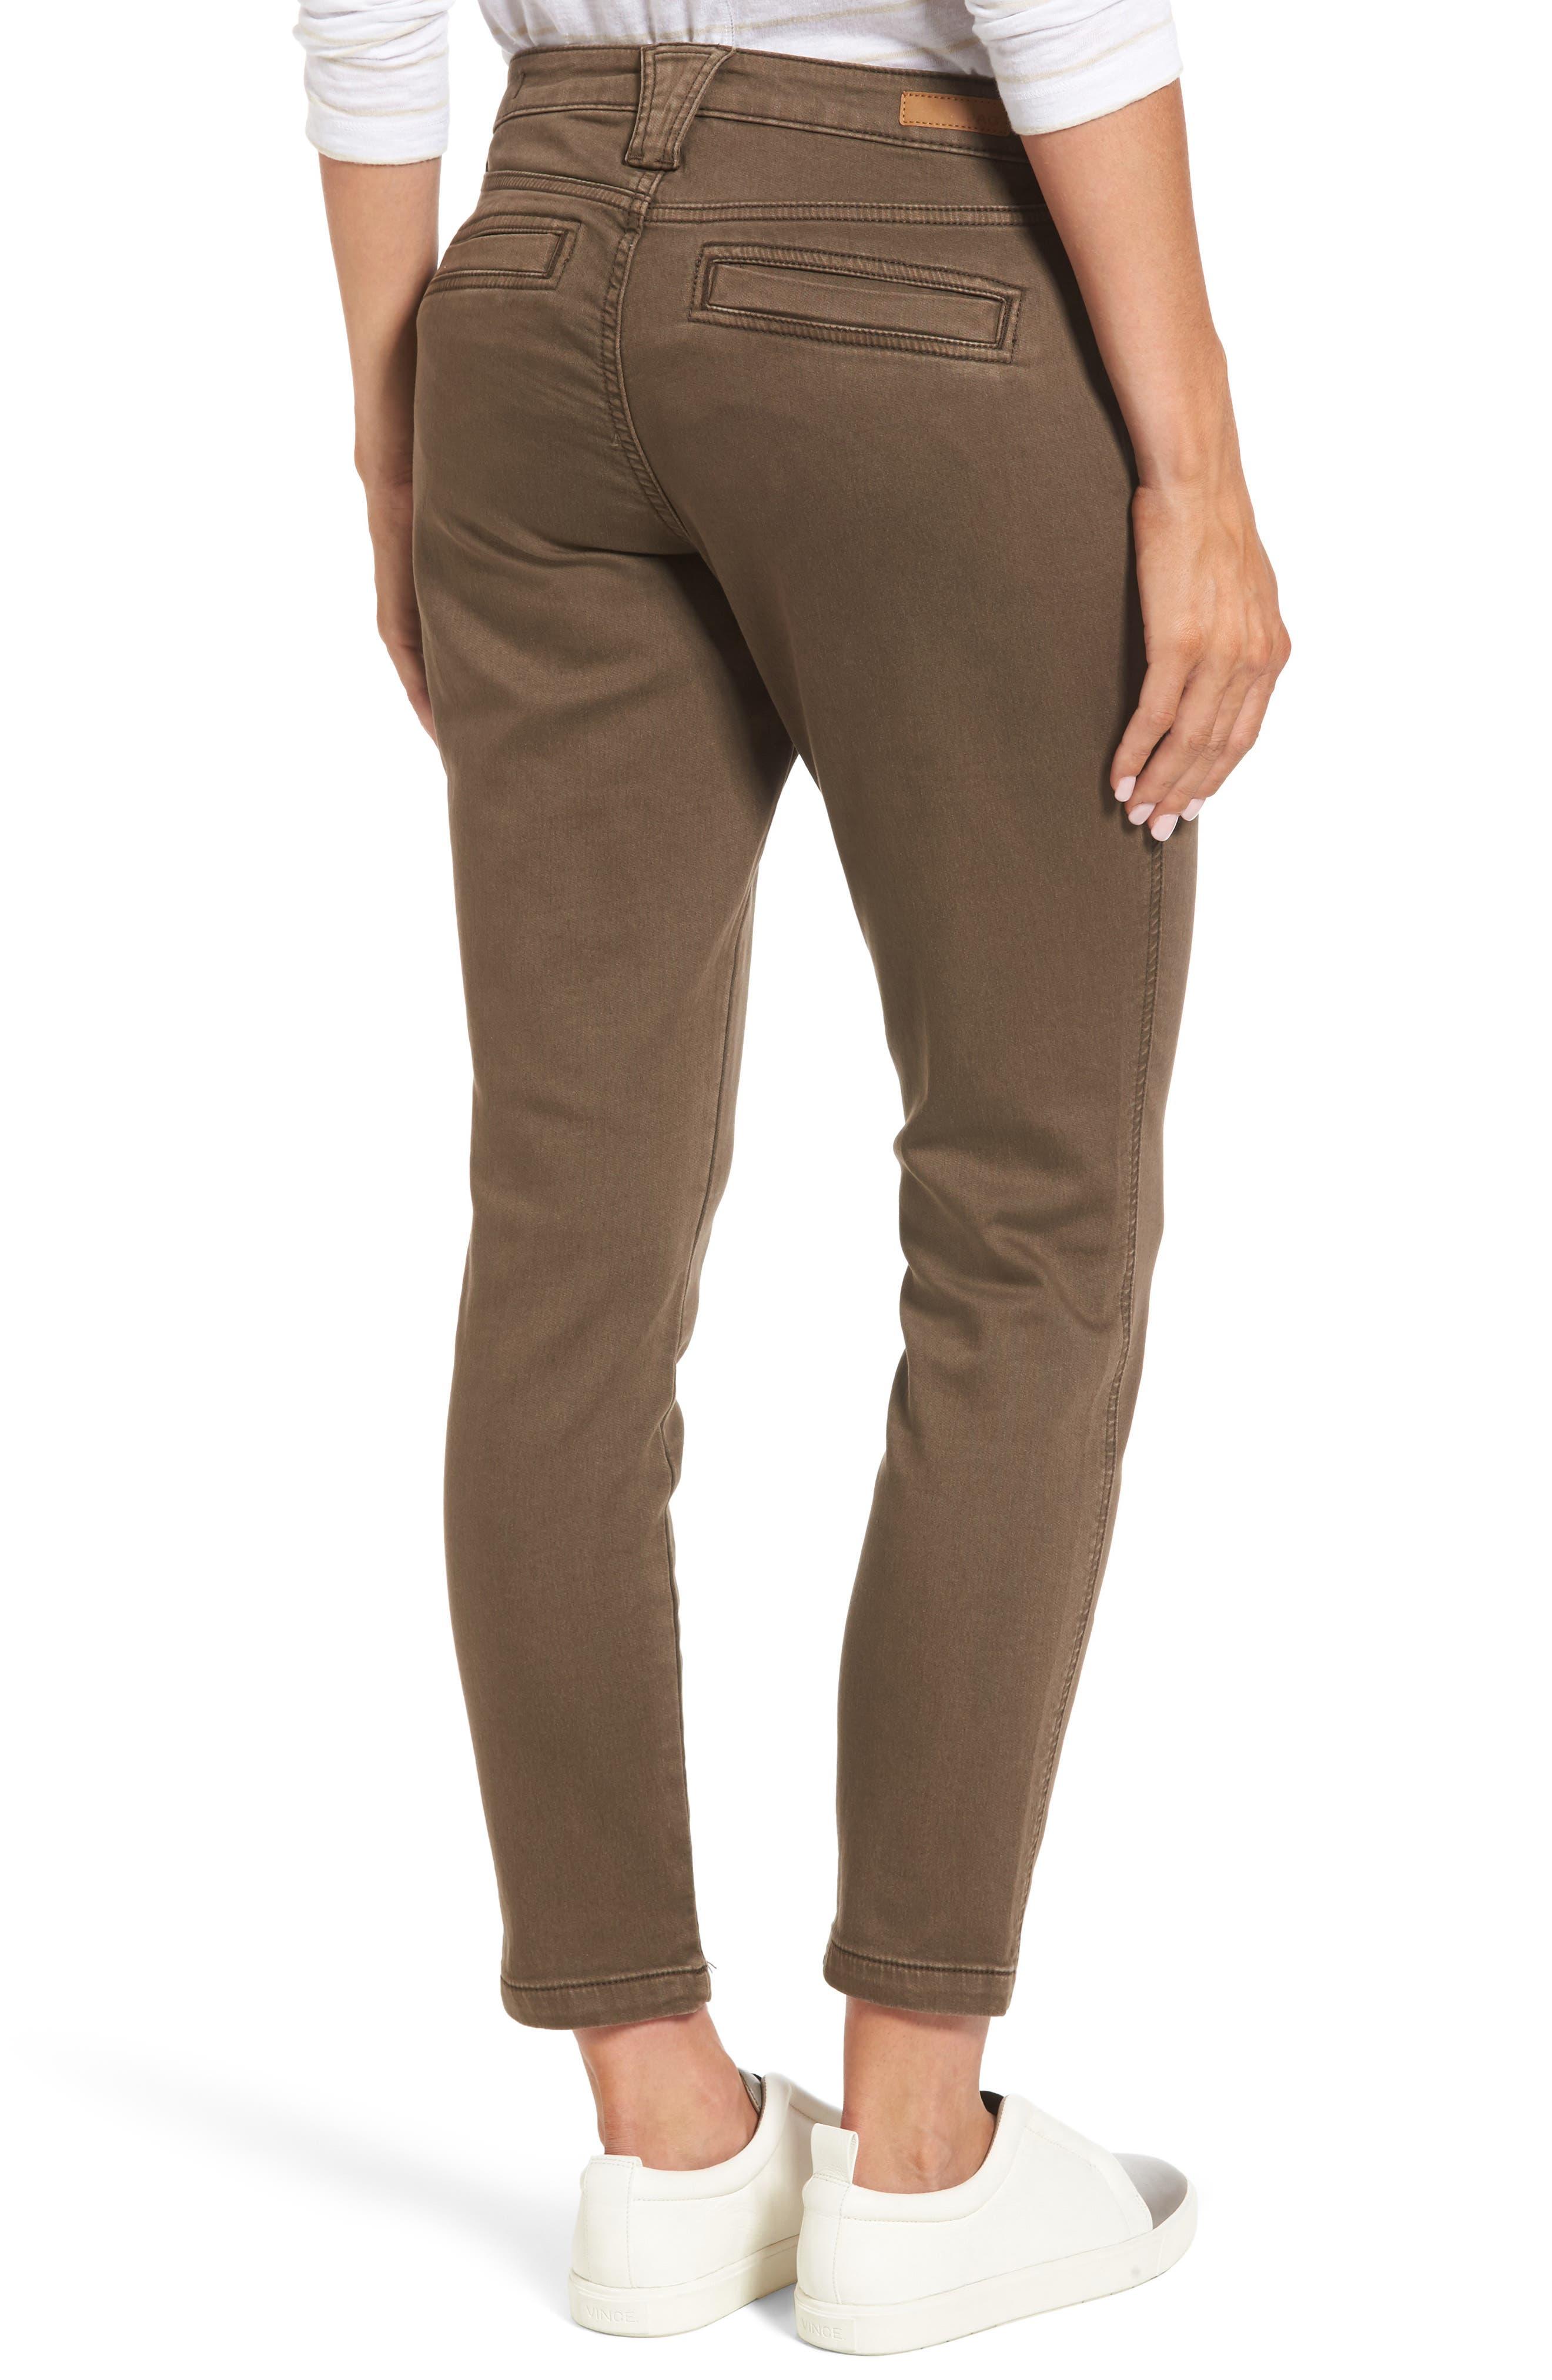 Ryan Knit Skinny Jeans,                             Alternate thumbnail 2, color,                             Saddle